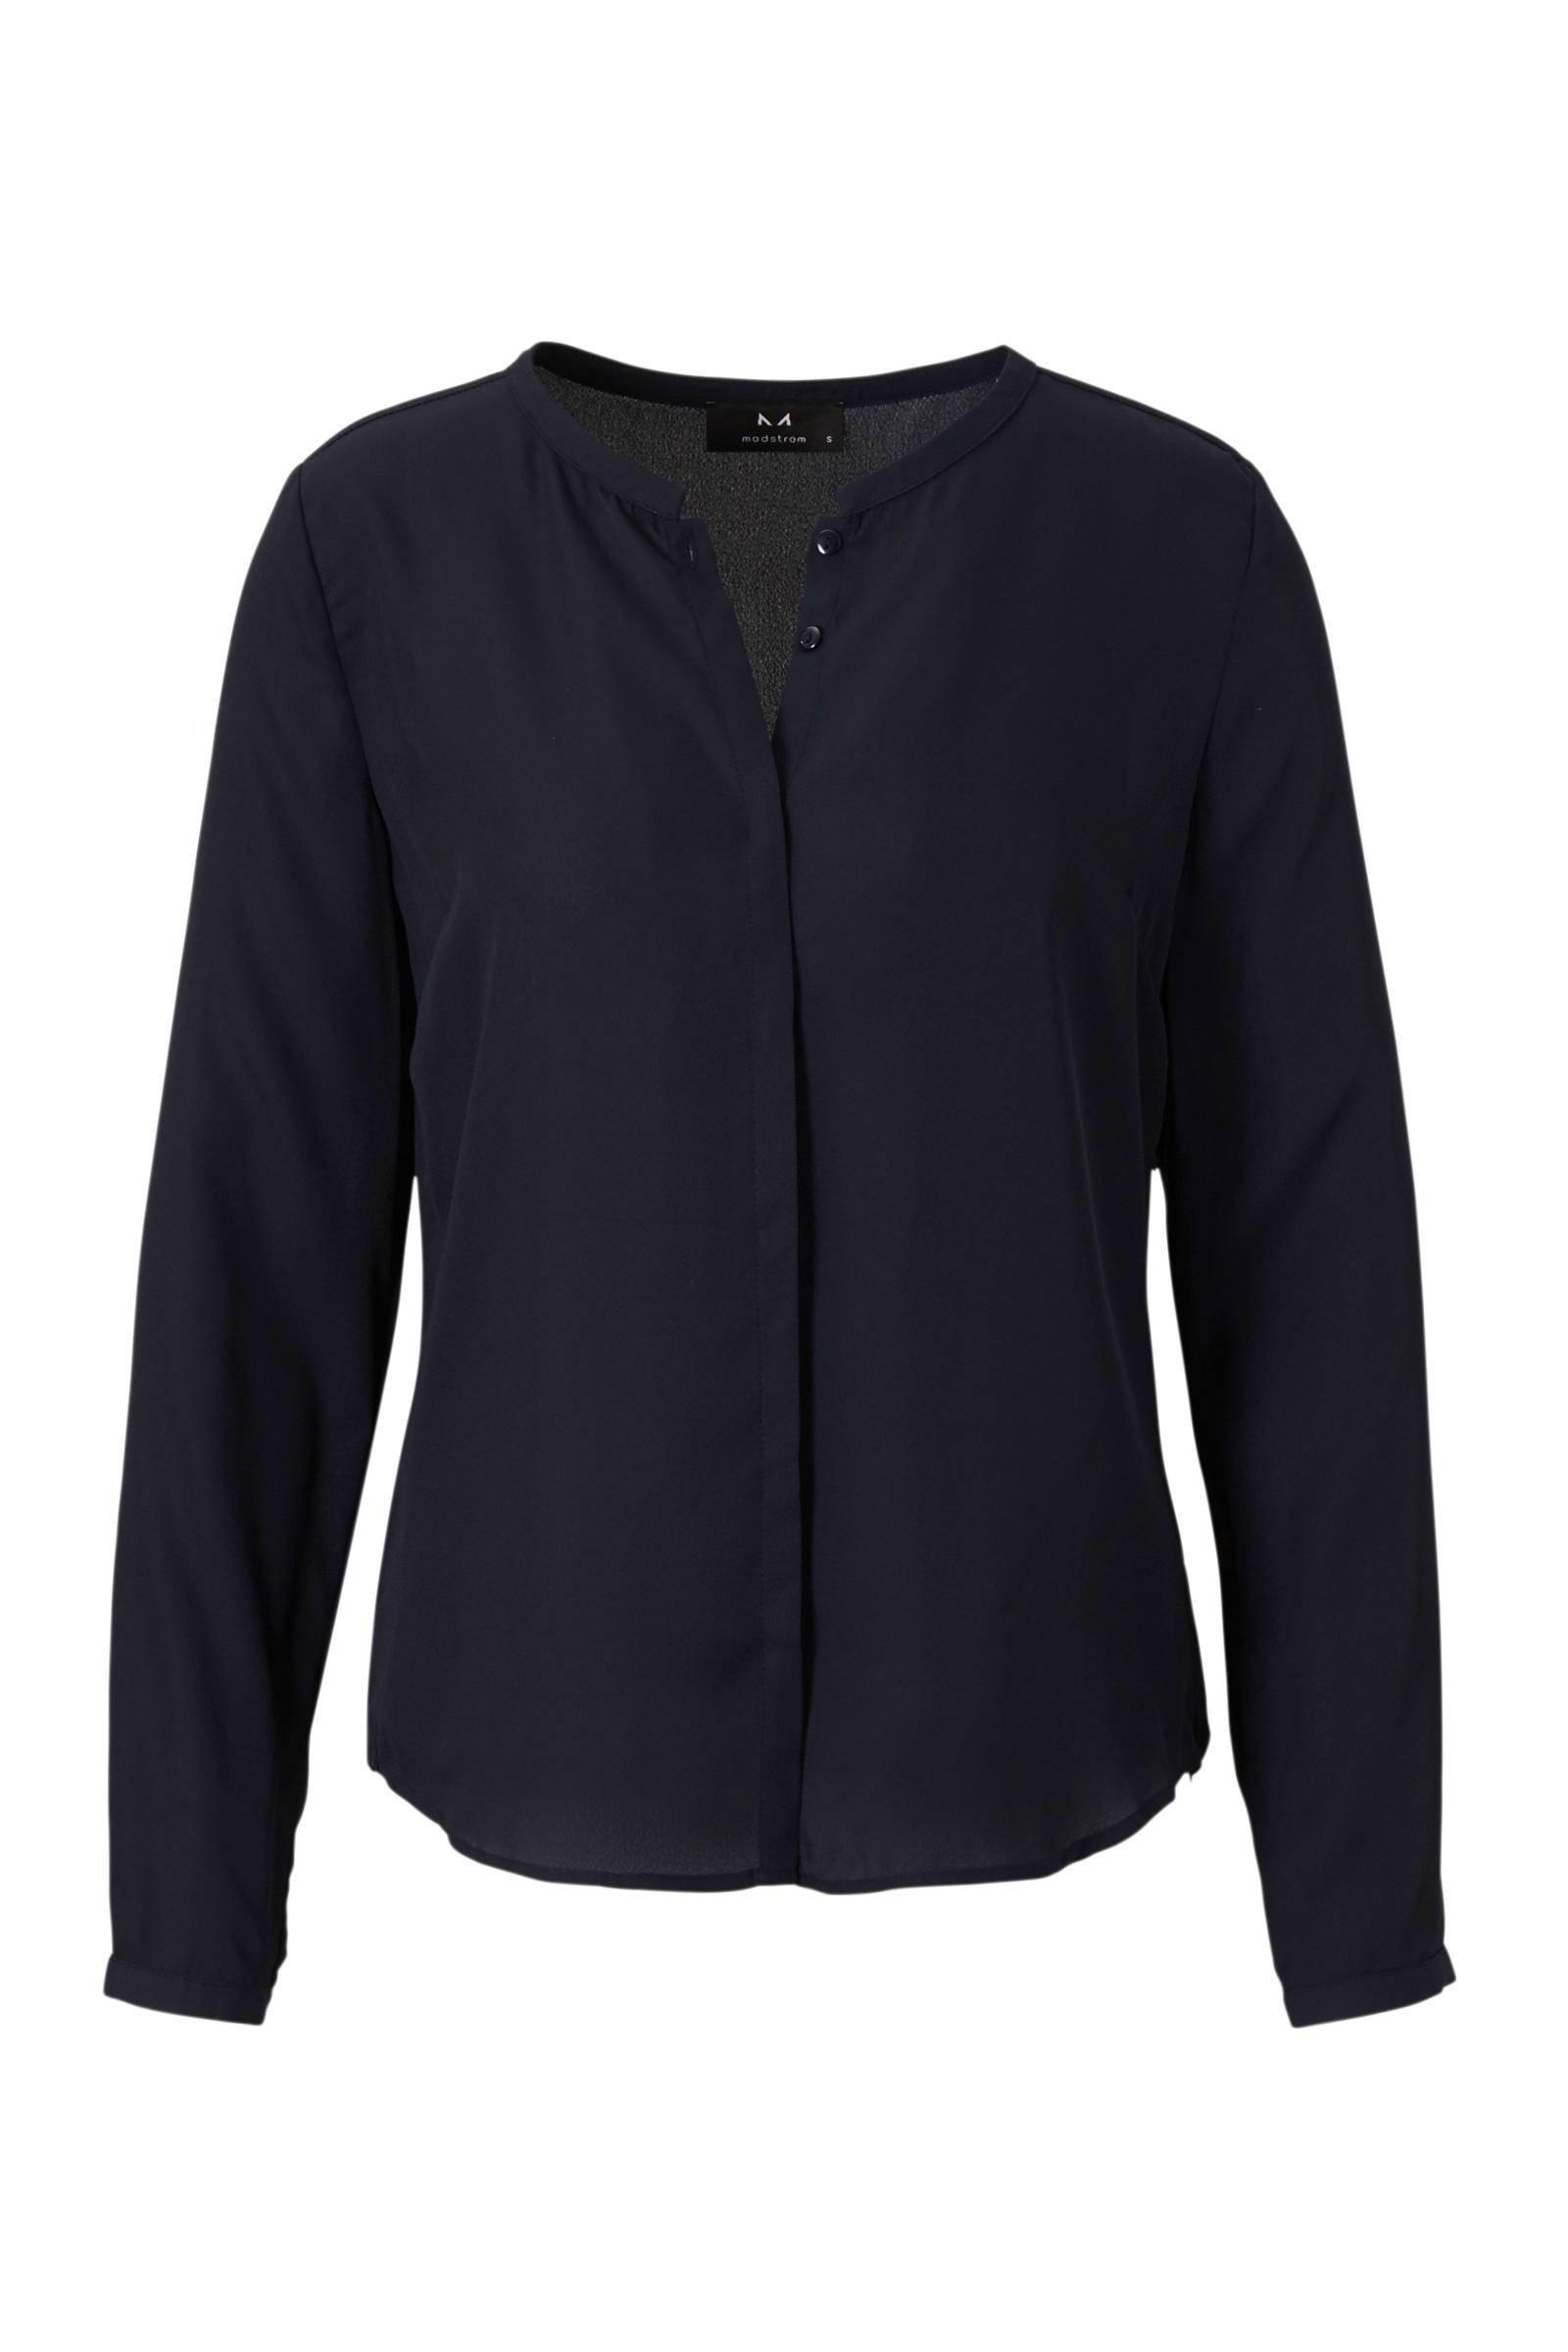 modström Cyler blouse (dames)